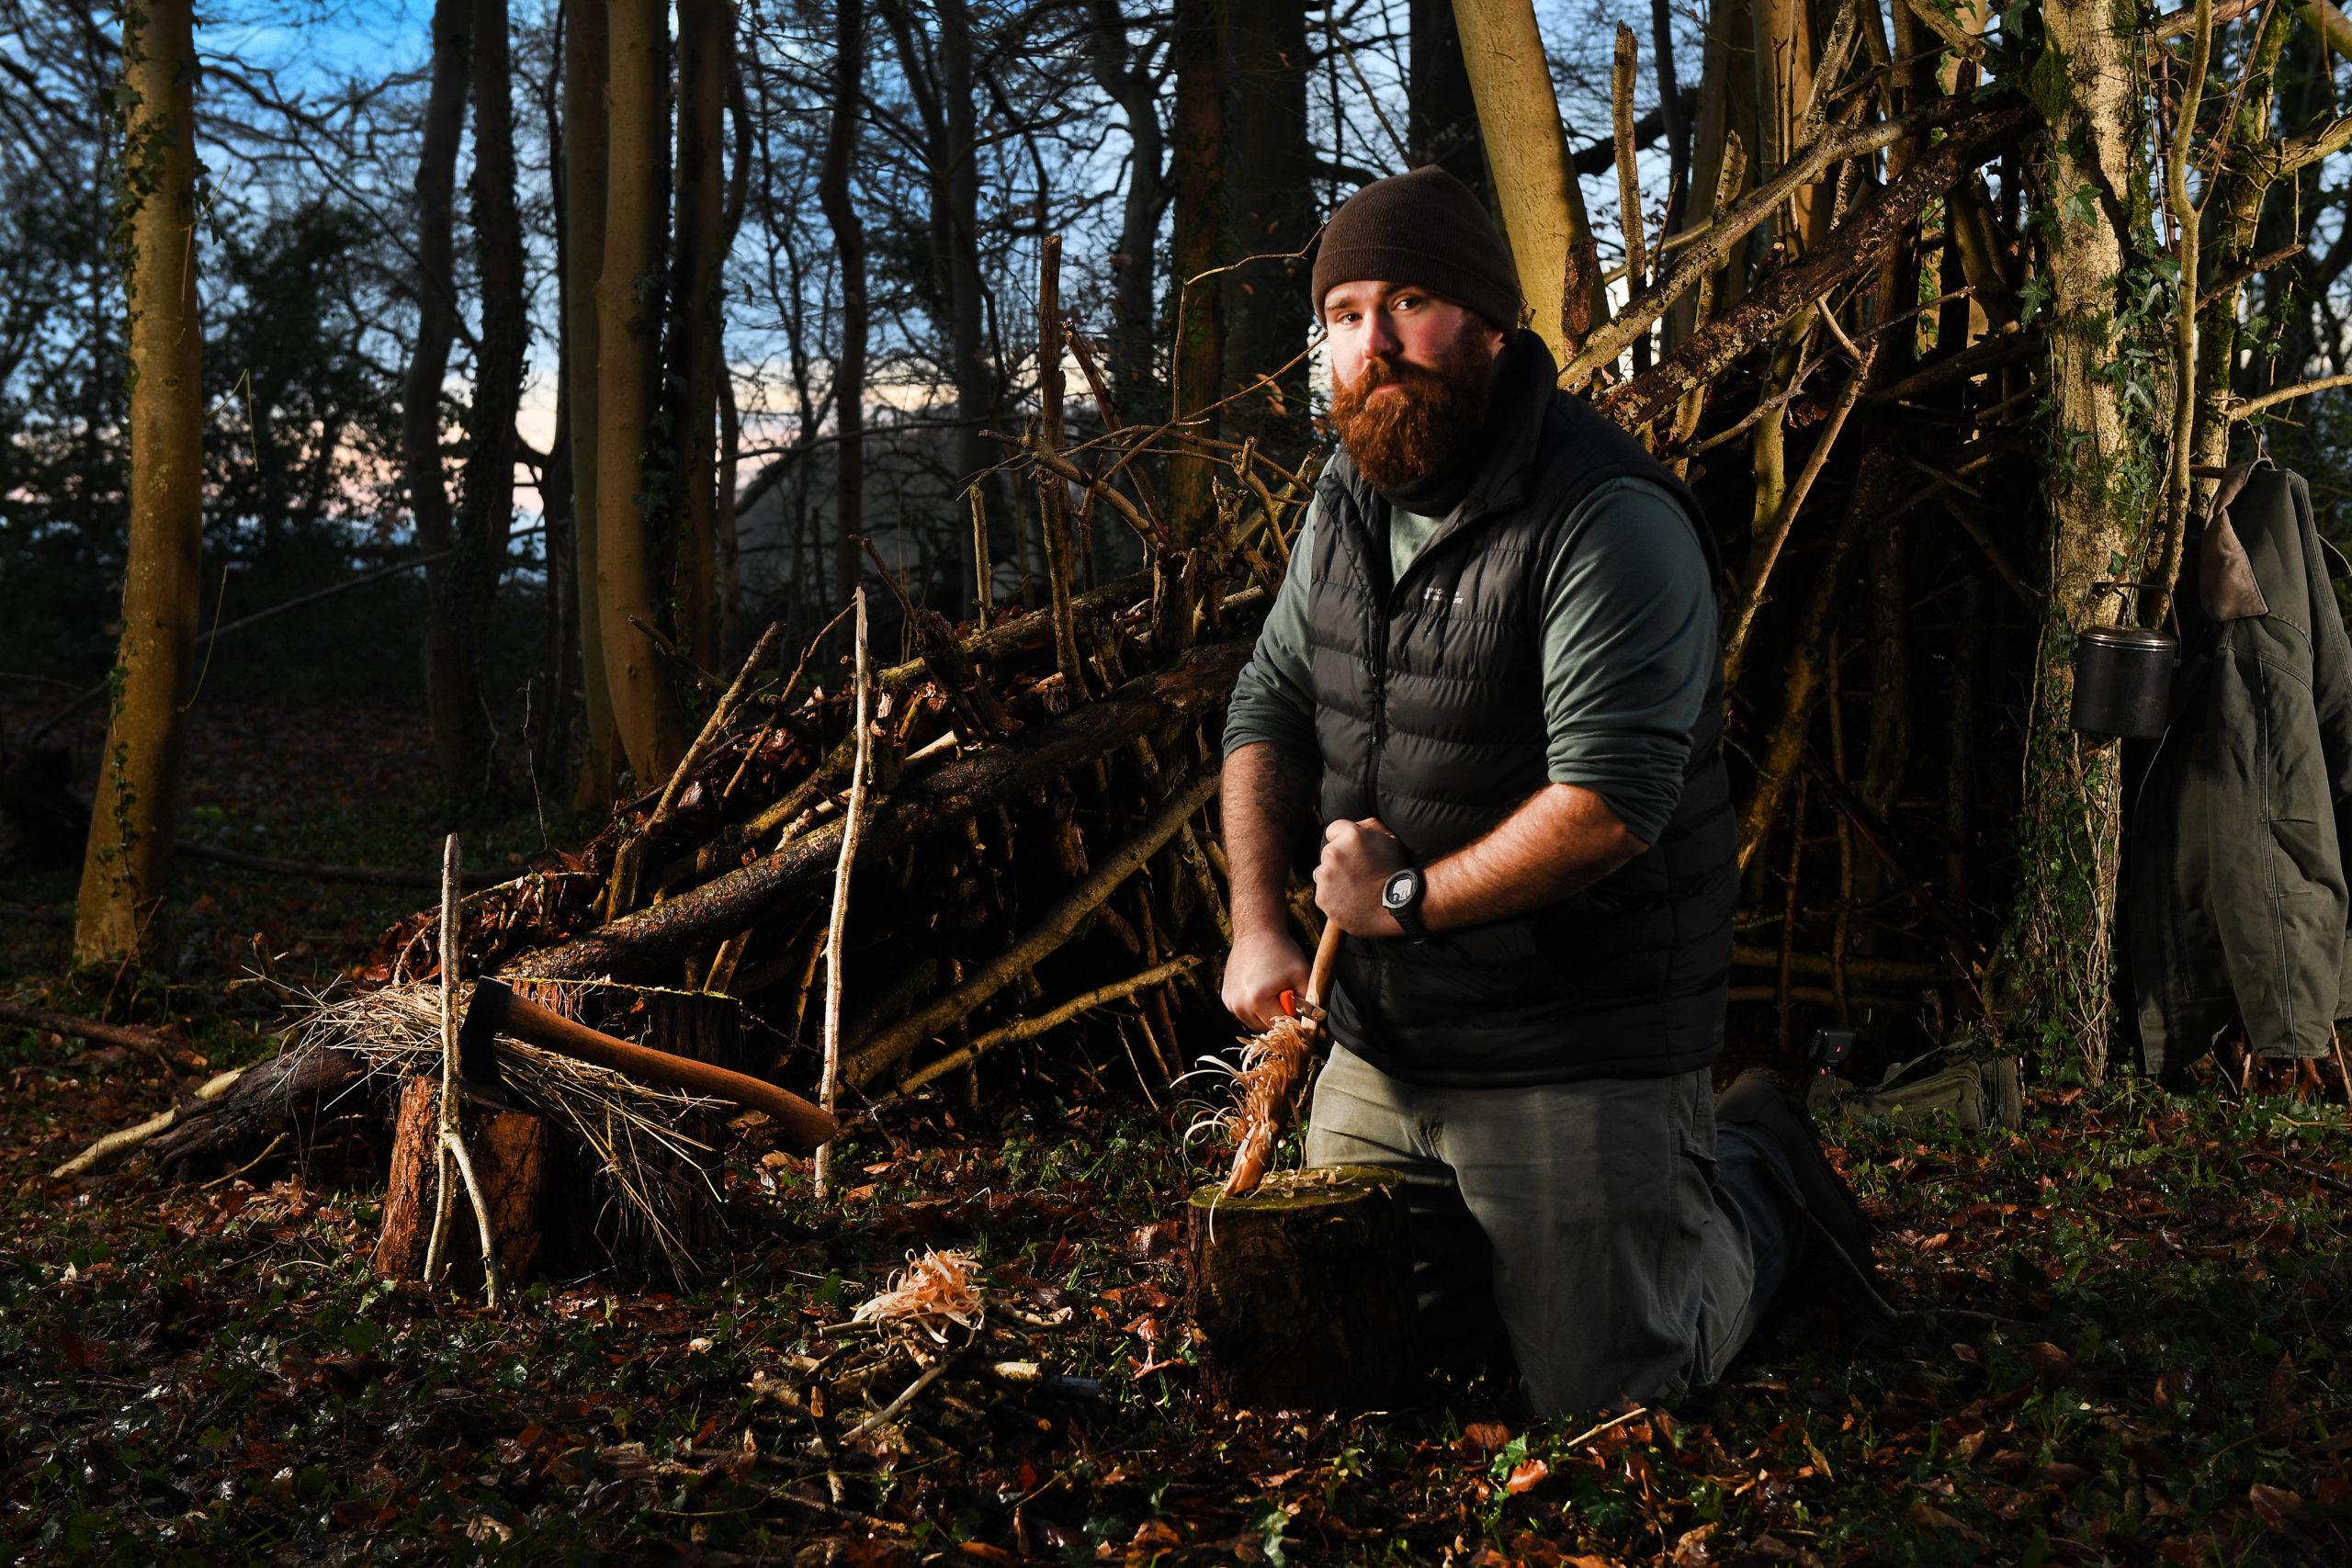 A man practicing bushcraft on our woodland bushcraft course